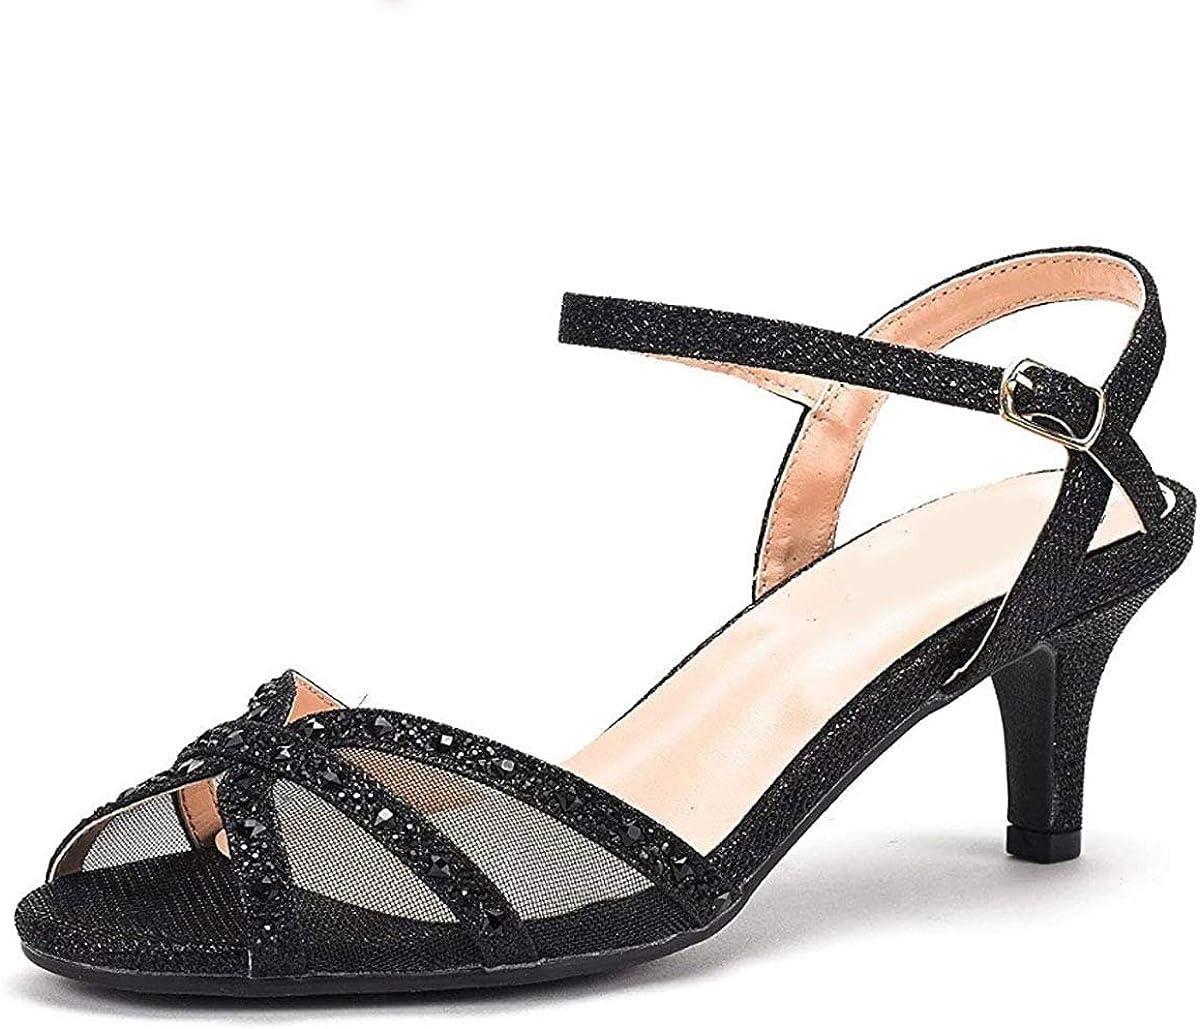 Fashion Thirsty Womens Low Large discharge sale Mid Shoes Wedding Diamante Glit San Antonio Mall Heels